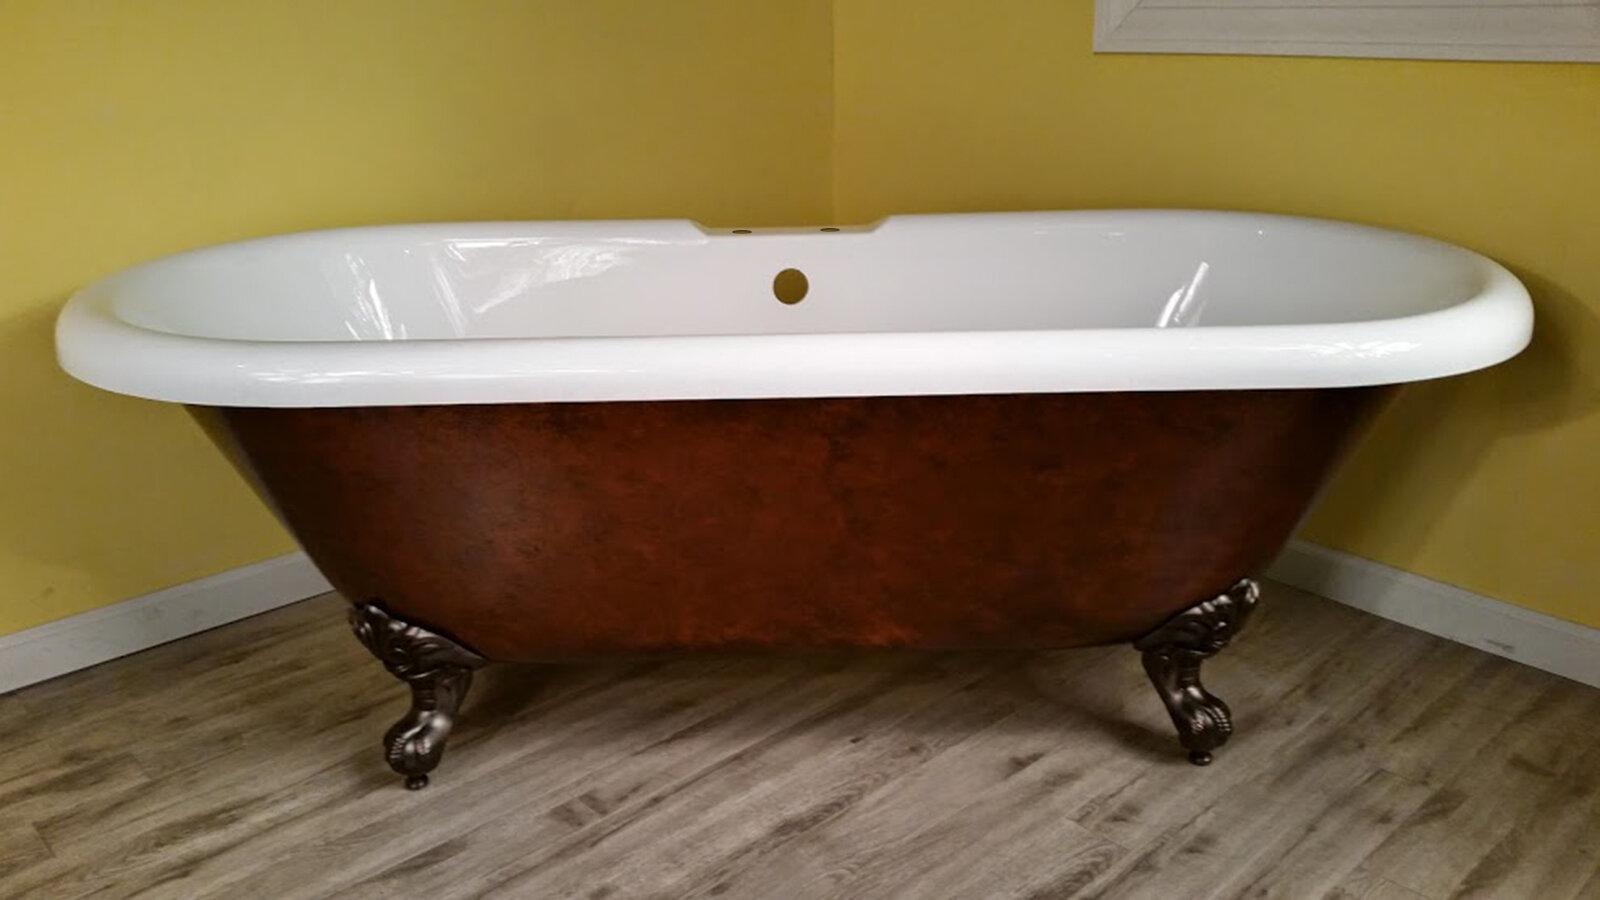 Cambridge Plumbing Acrylic Slipper Clawfoot 60 X 30 Freestanding Soaking Bathtub Wayfair